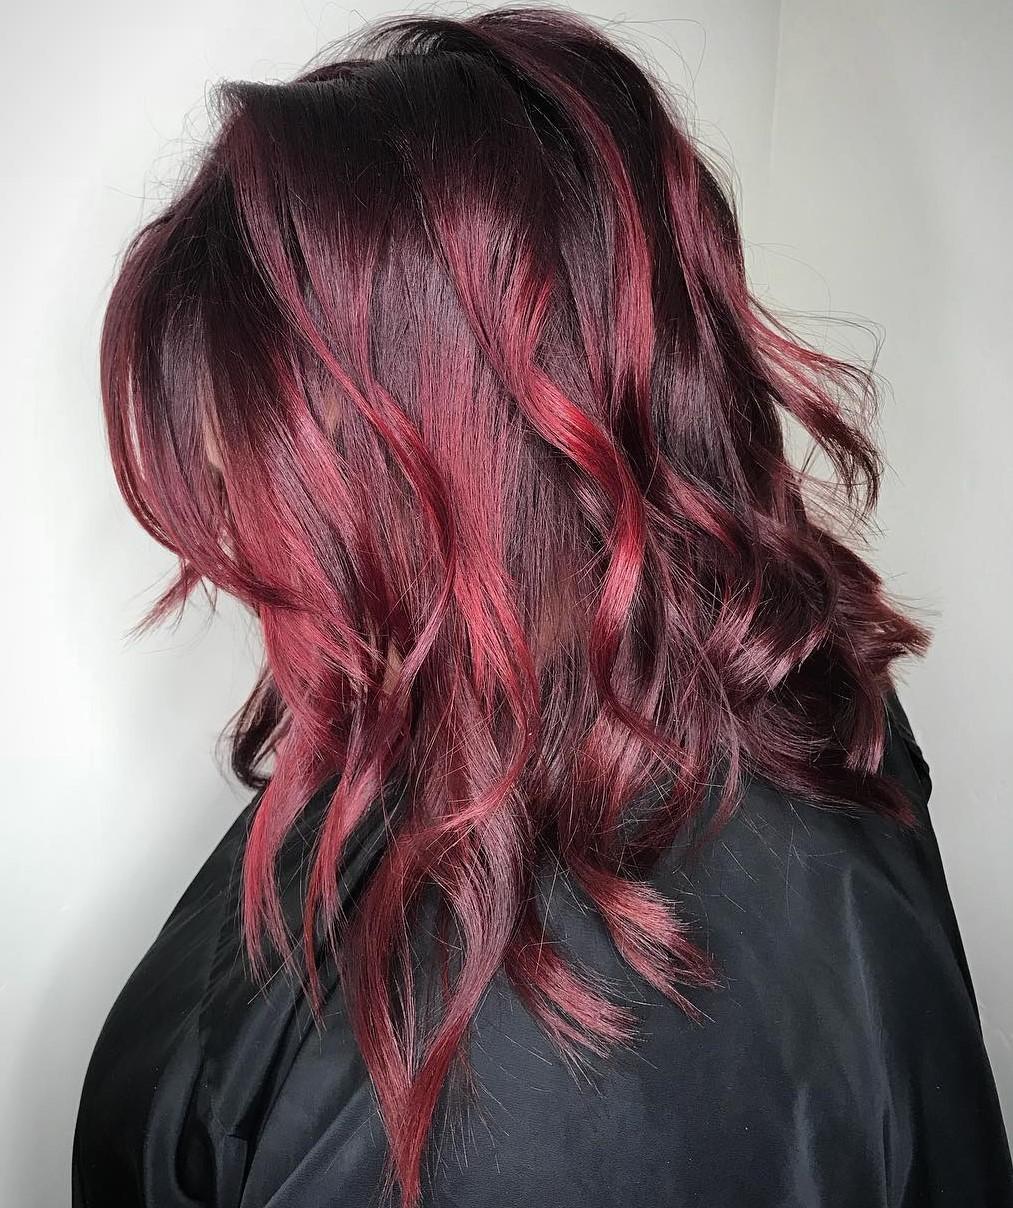 Dark Hair with Bright Burgundy Highlights